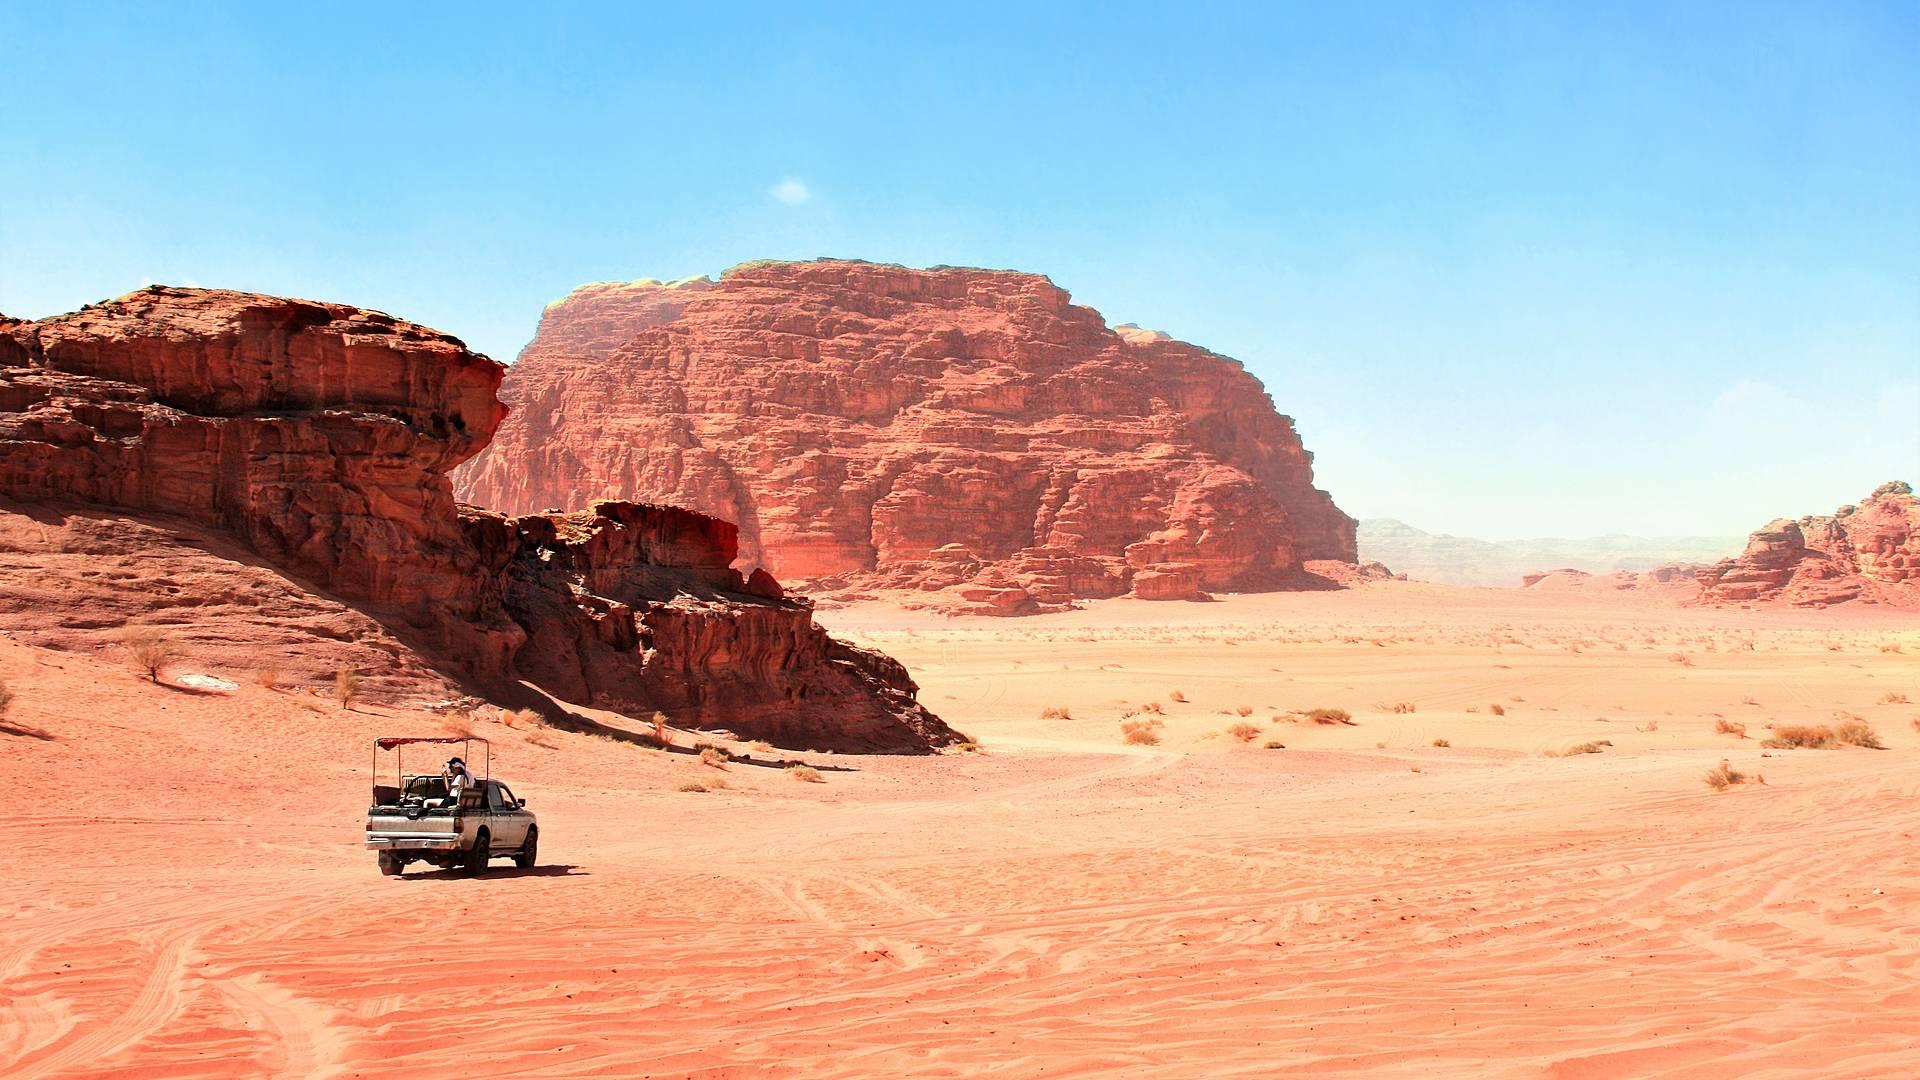 Leyendas de Jordania y desierto